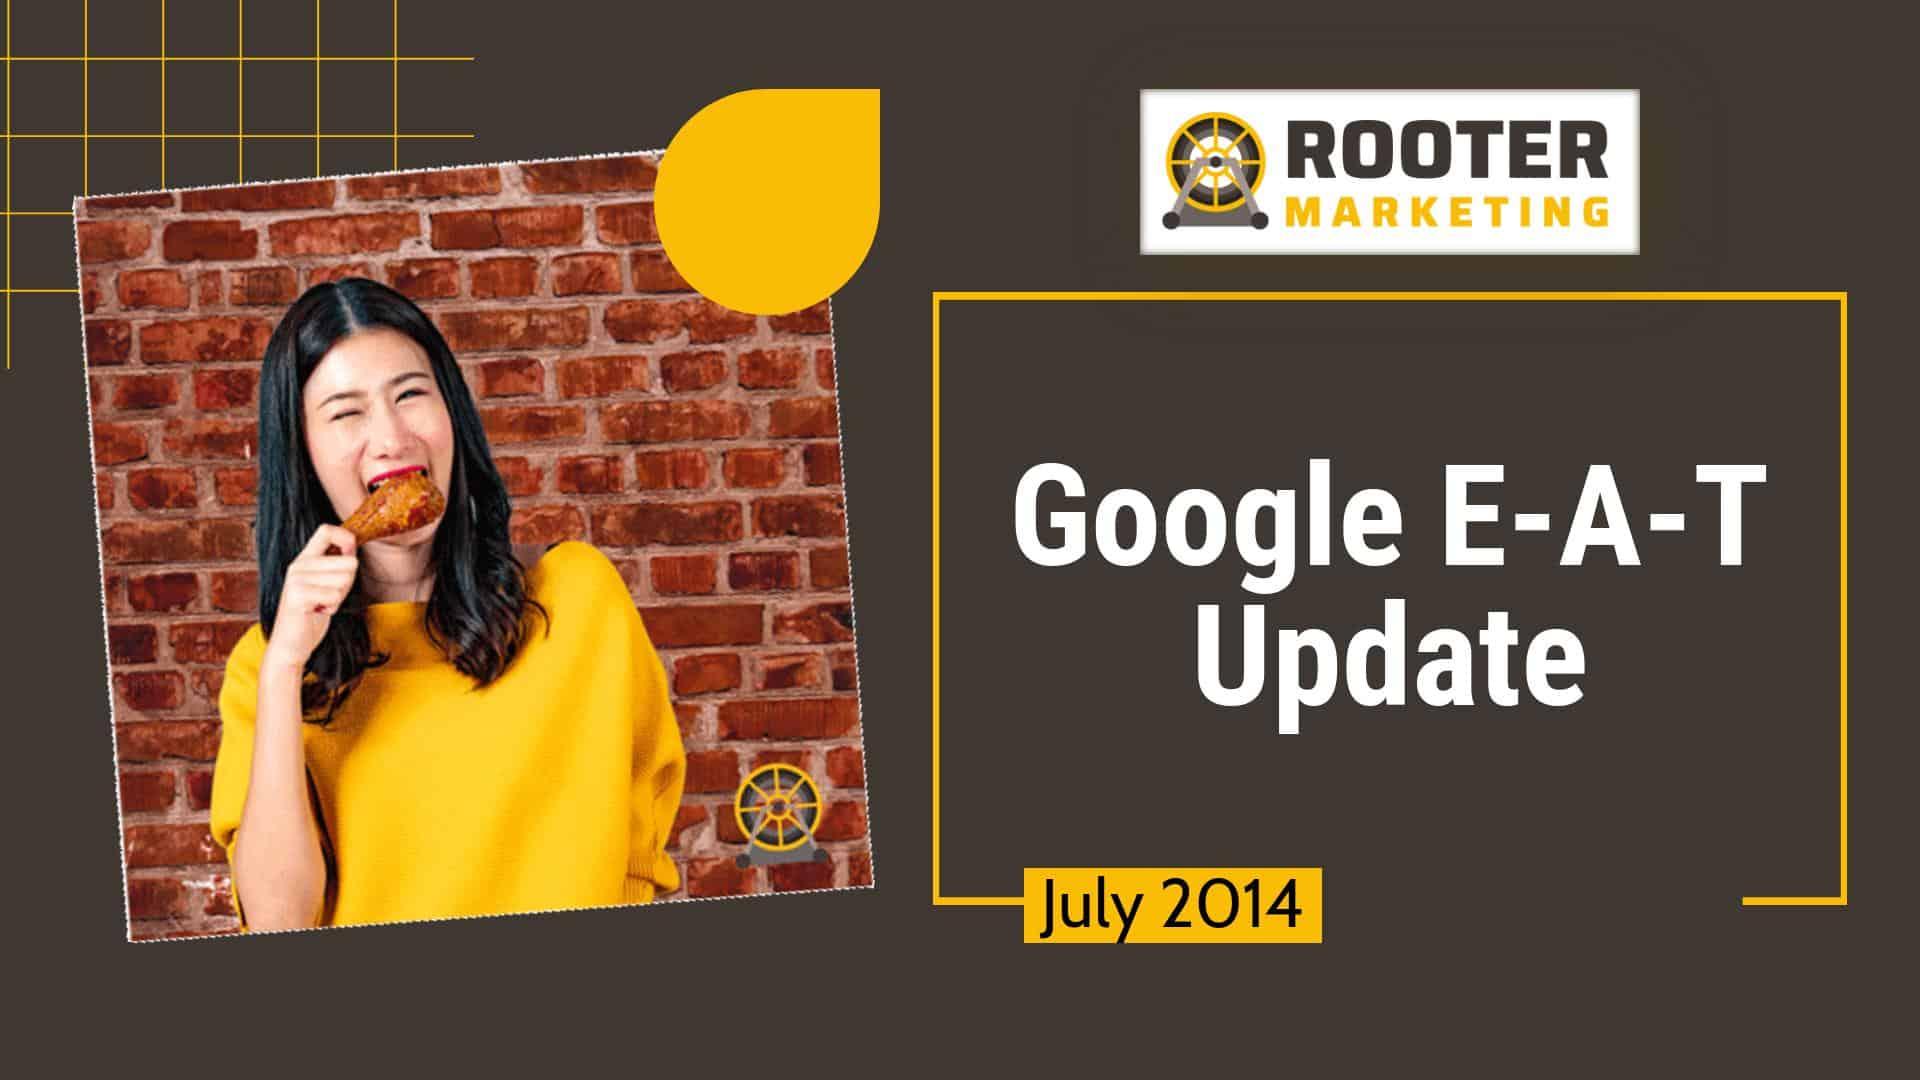 Google SEO E-A-T Update Rooter Marketing Plumbing SEO